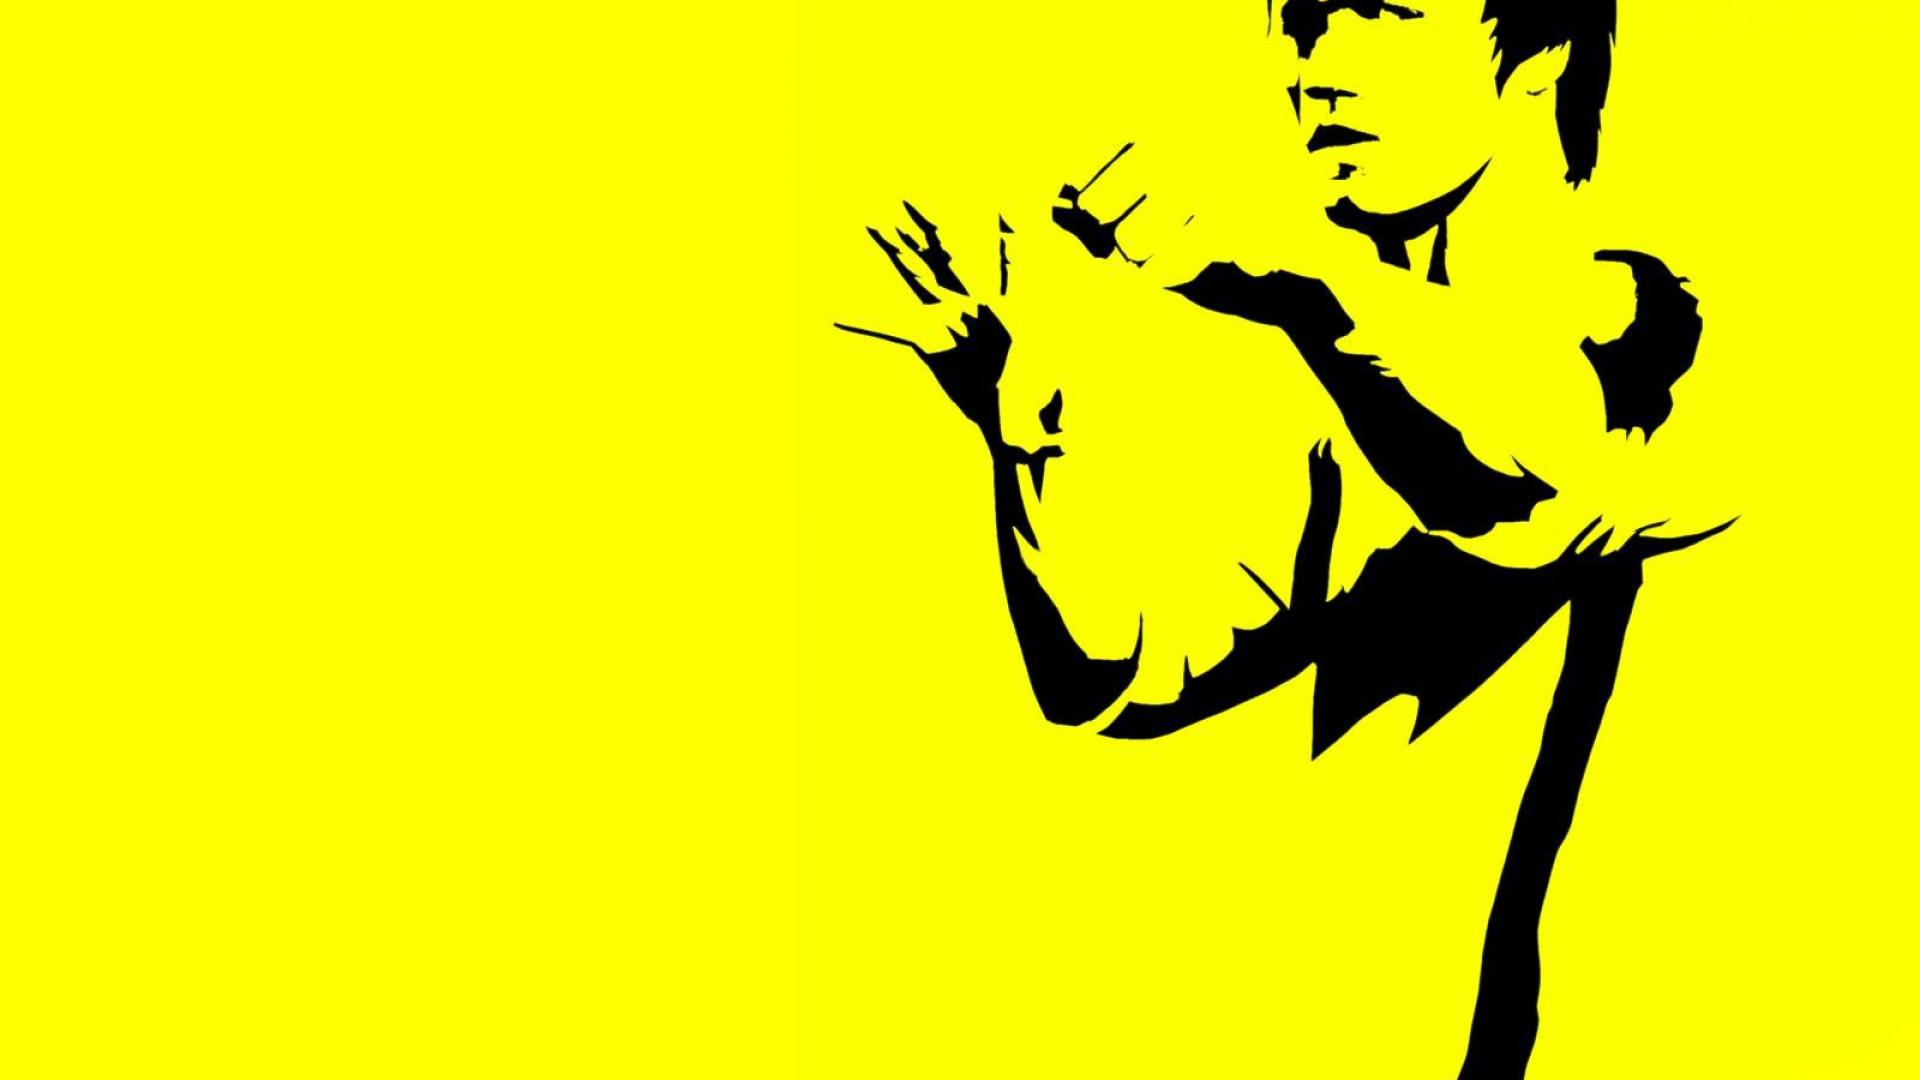 1920x1080 Bruce Lee Images Hd